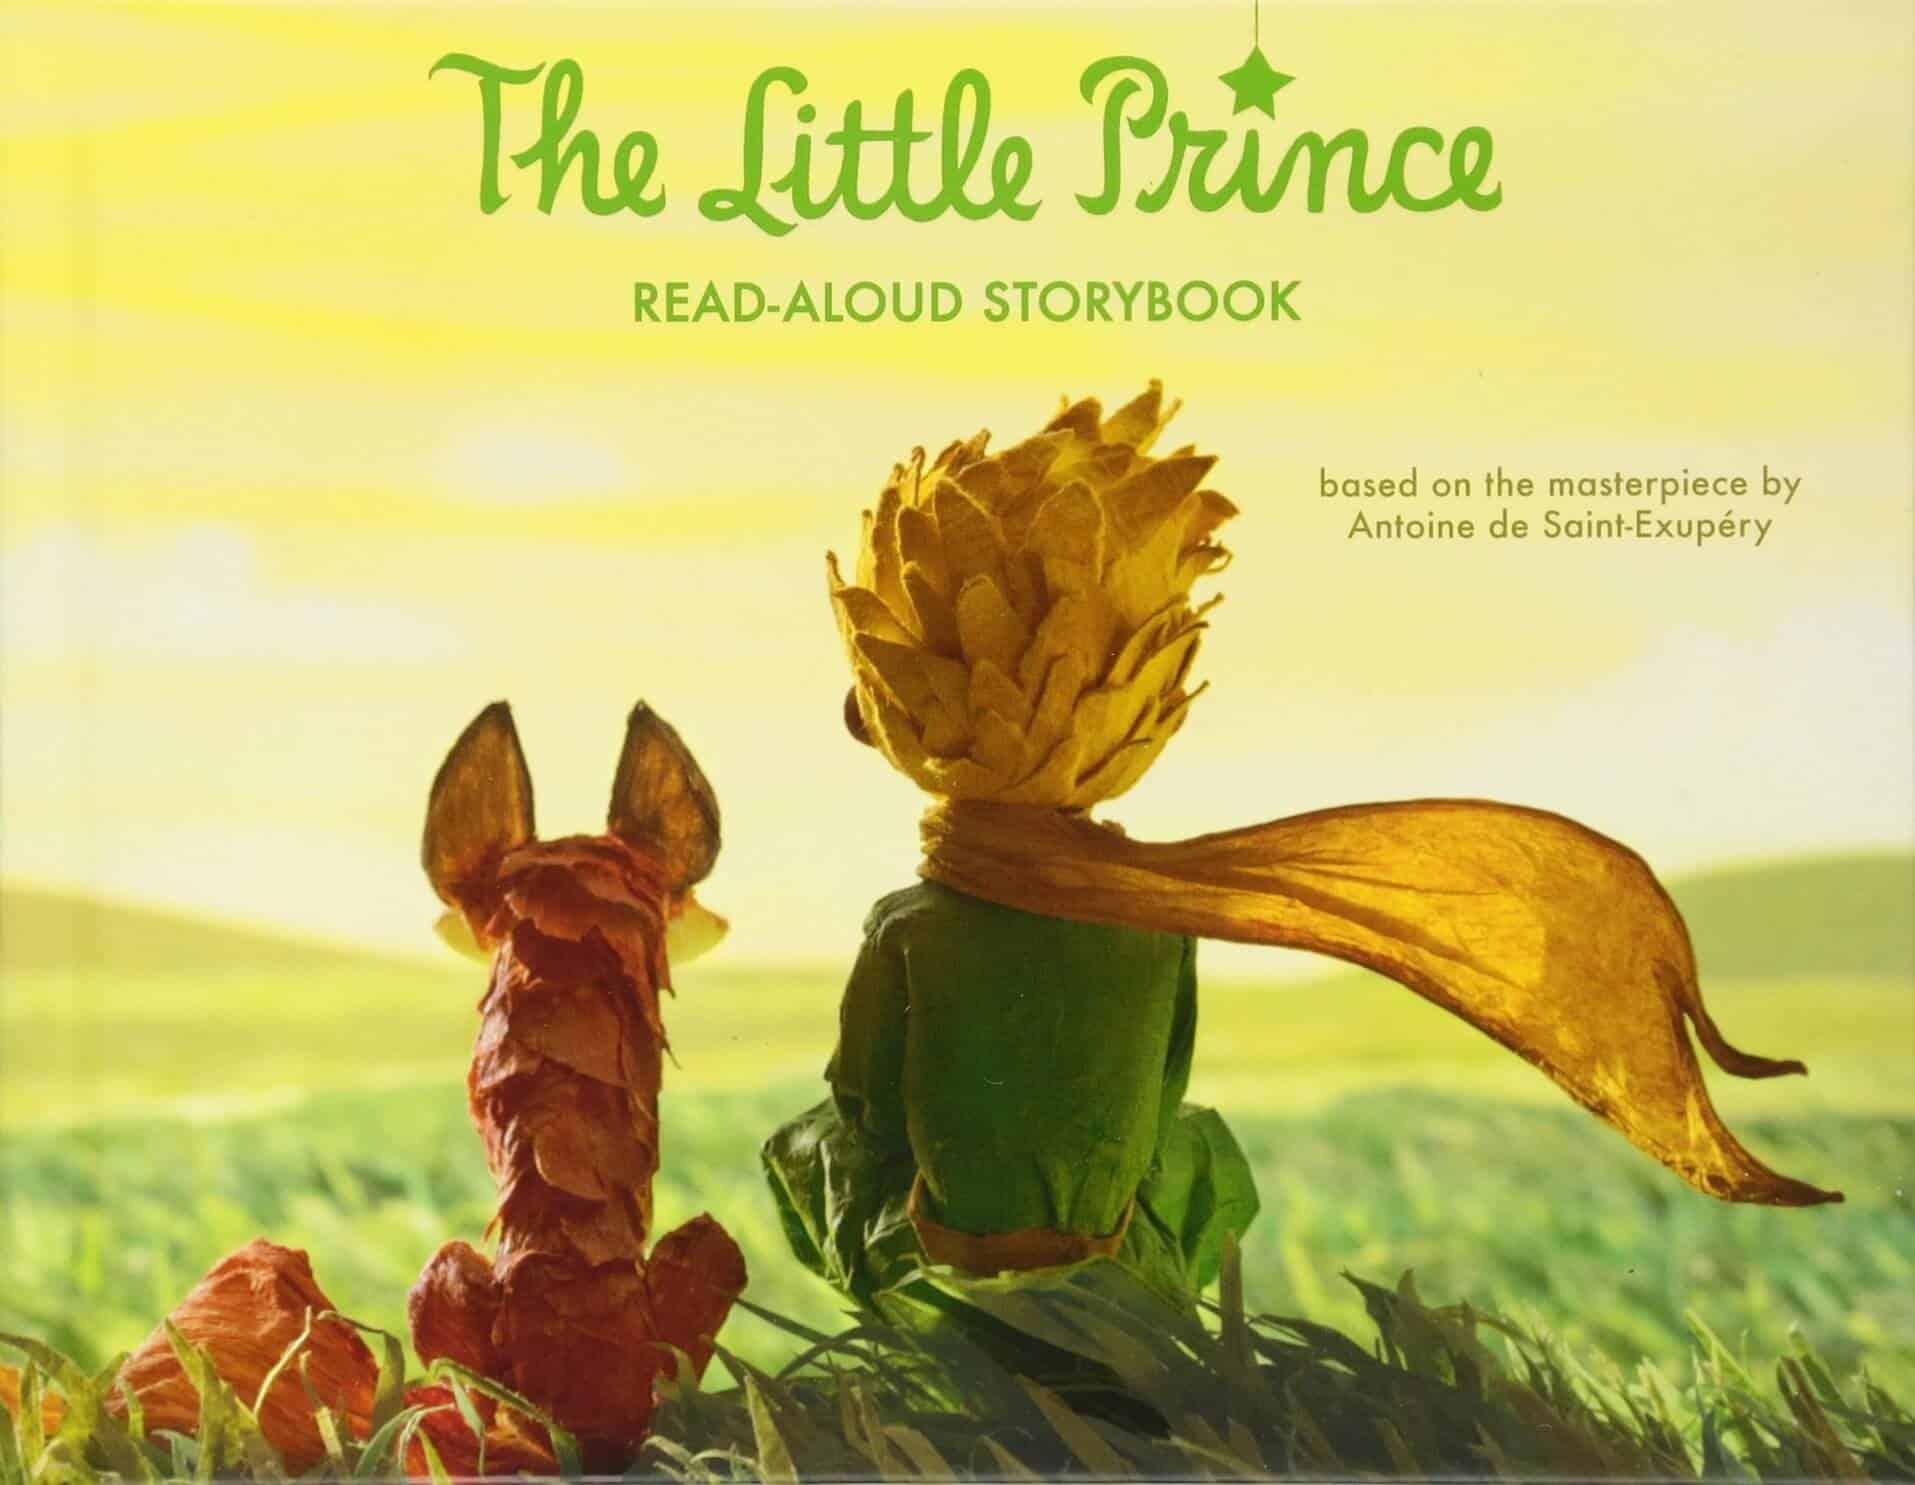 The Little Prince: A Story (นิทานเจ้าชายน้อย)